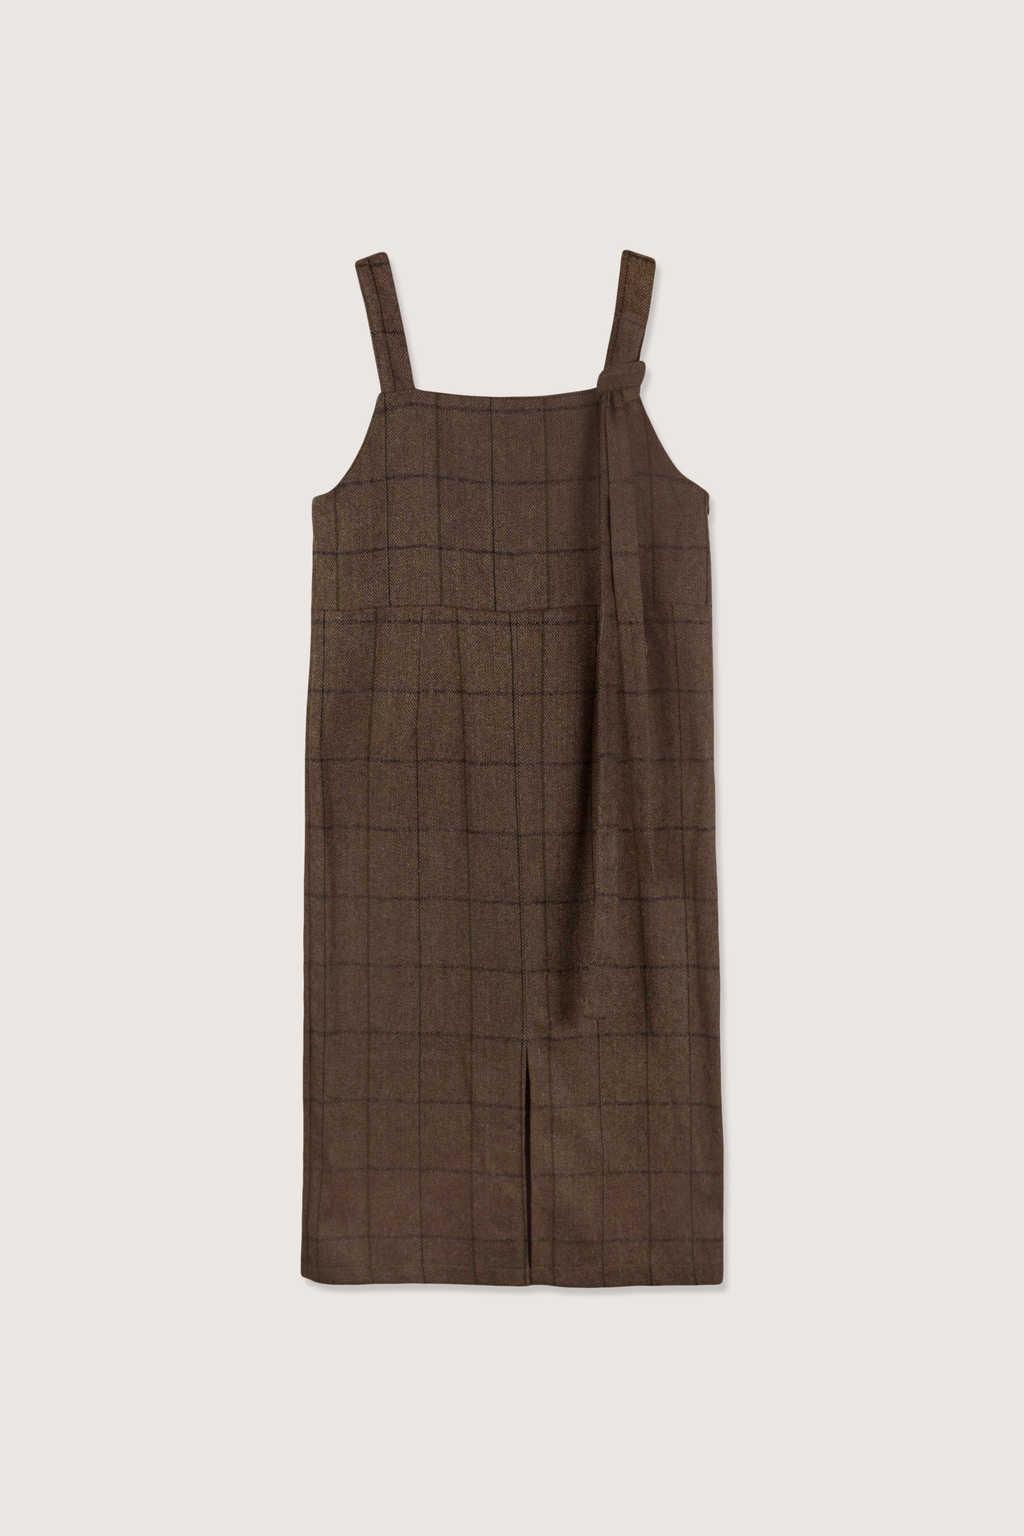 Dress H344 Beige 5